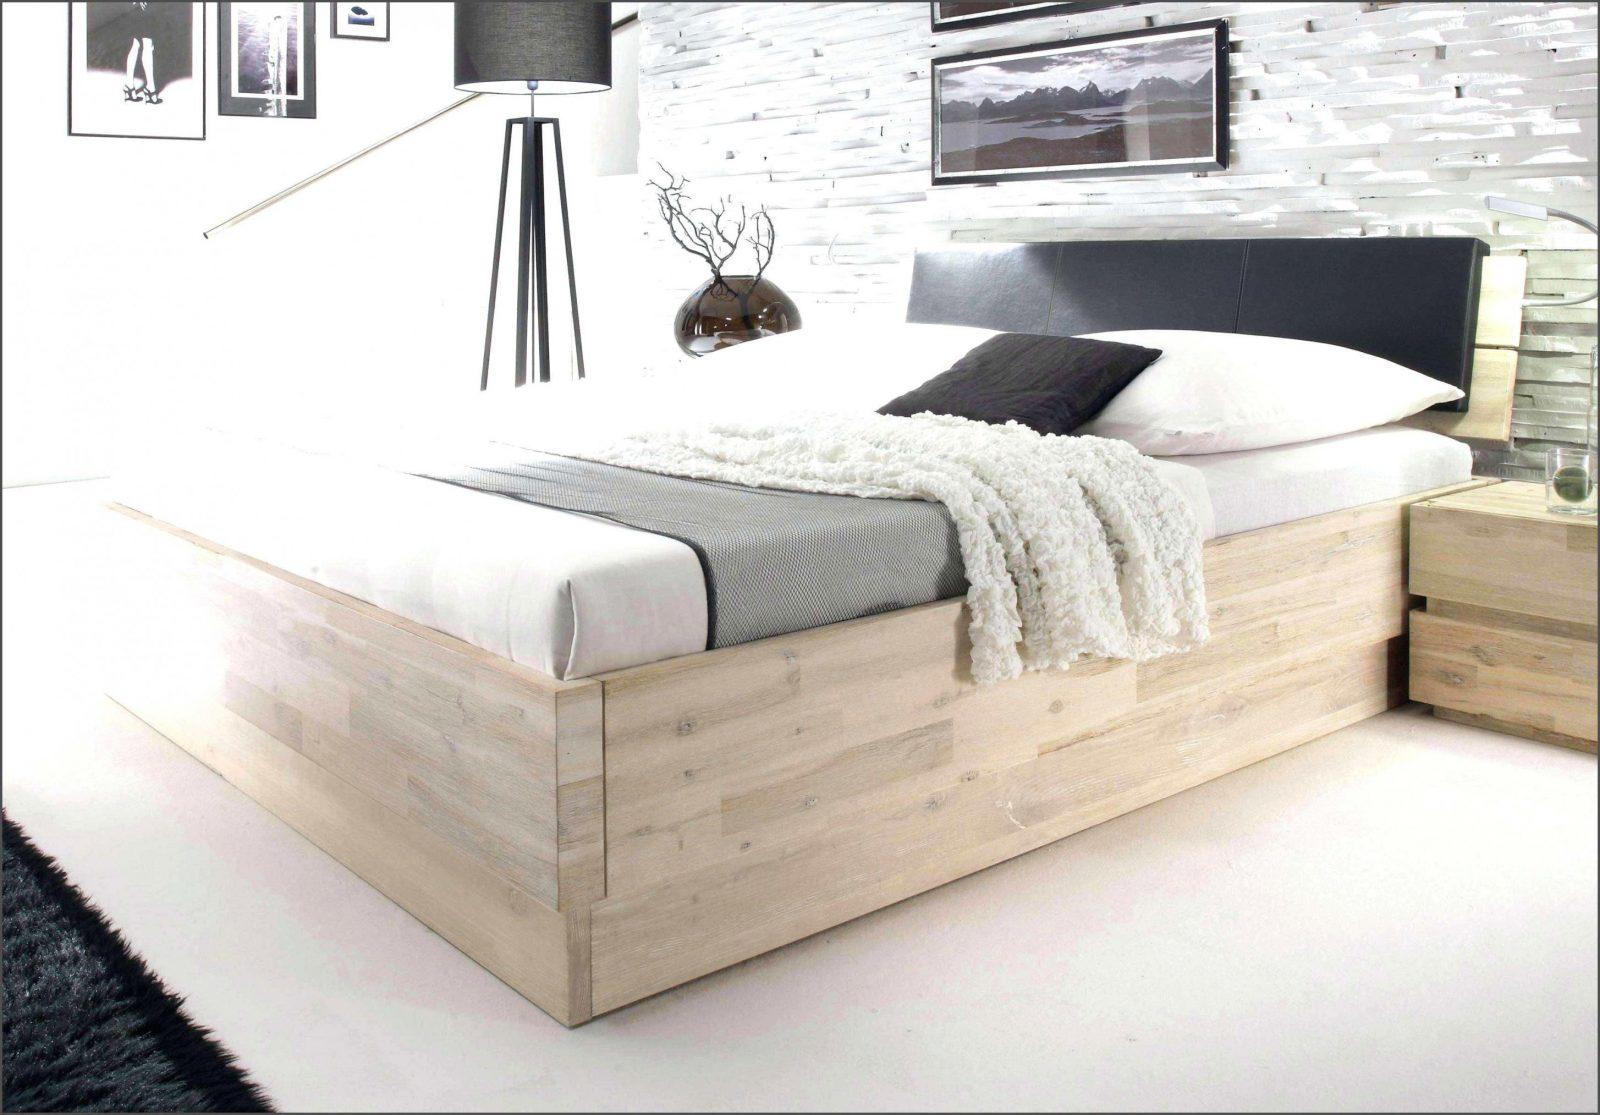 Wohnkultur Hohes Bett 180X200 Bettgestell Schon Doppelbett von Hohes Bett 180X200 Photo